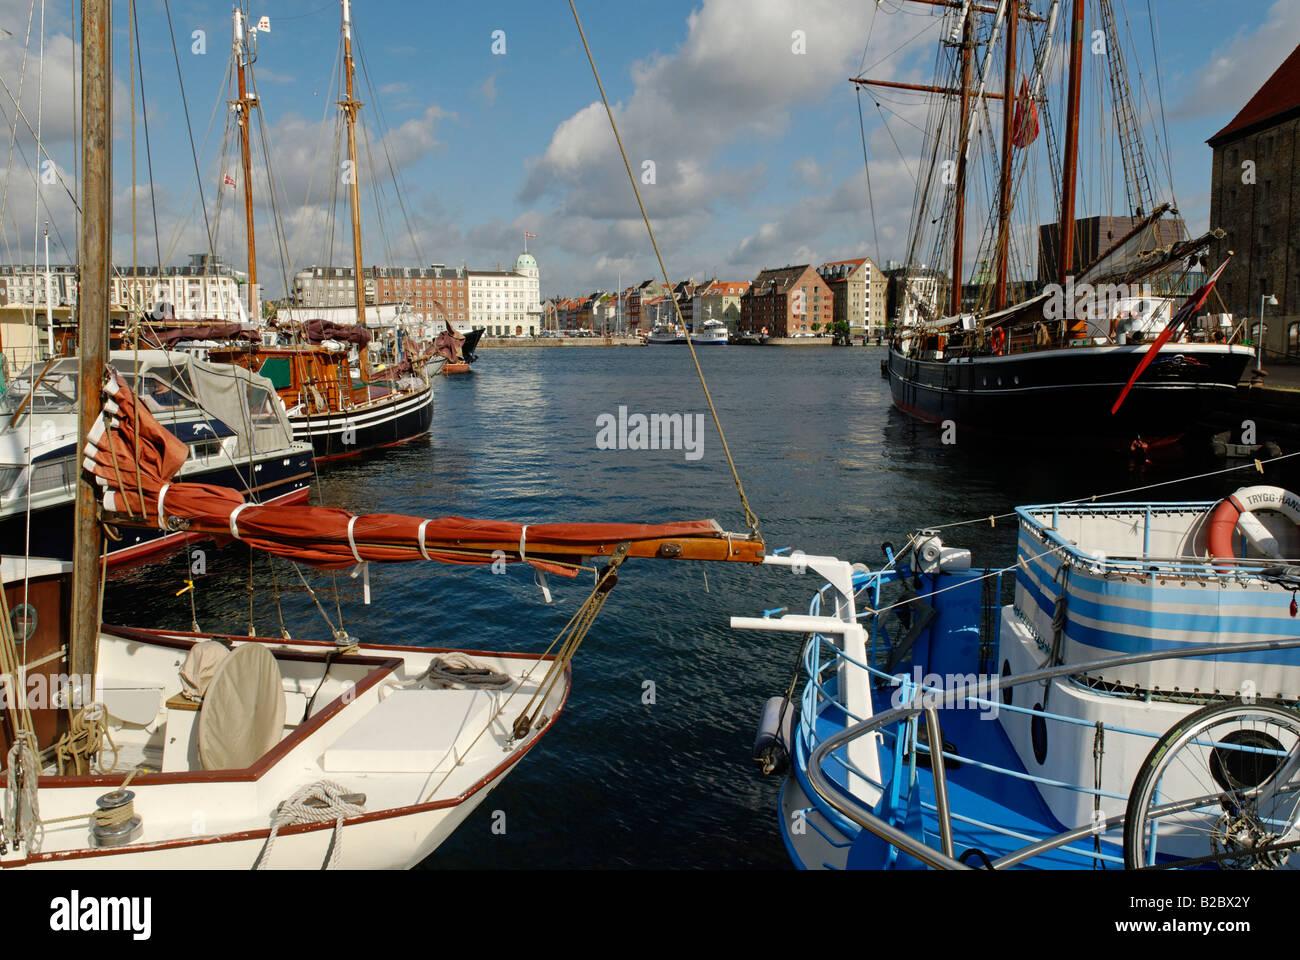 Boats in the docks of Groenlanske Handels Plads, Copenhagen, Denmark, Scandinavia, Europe - Stock Image